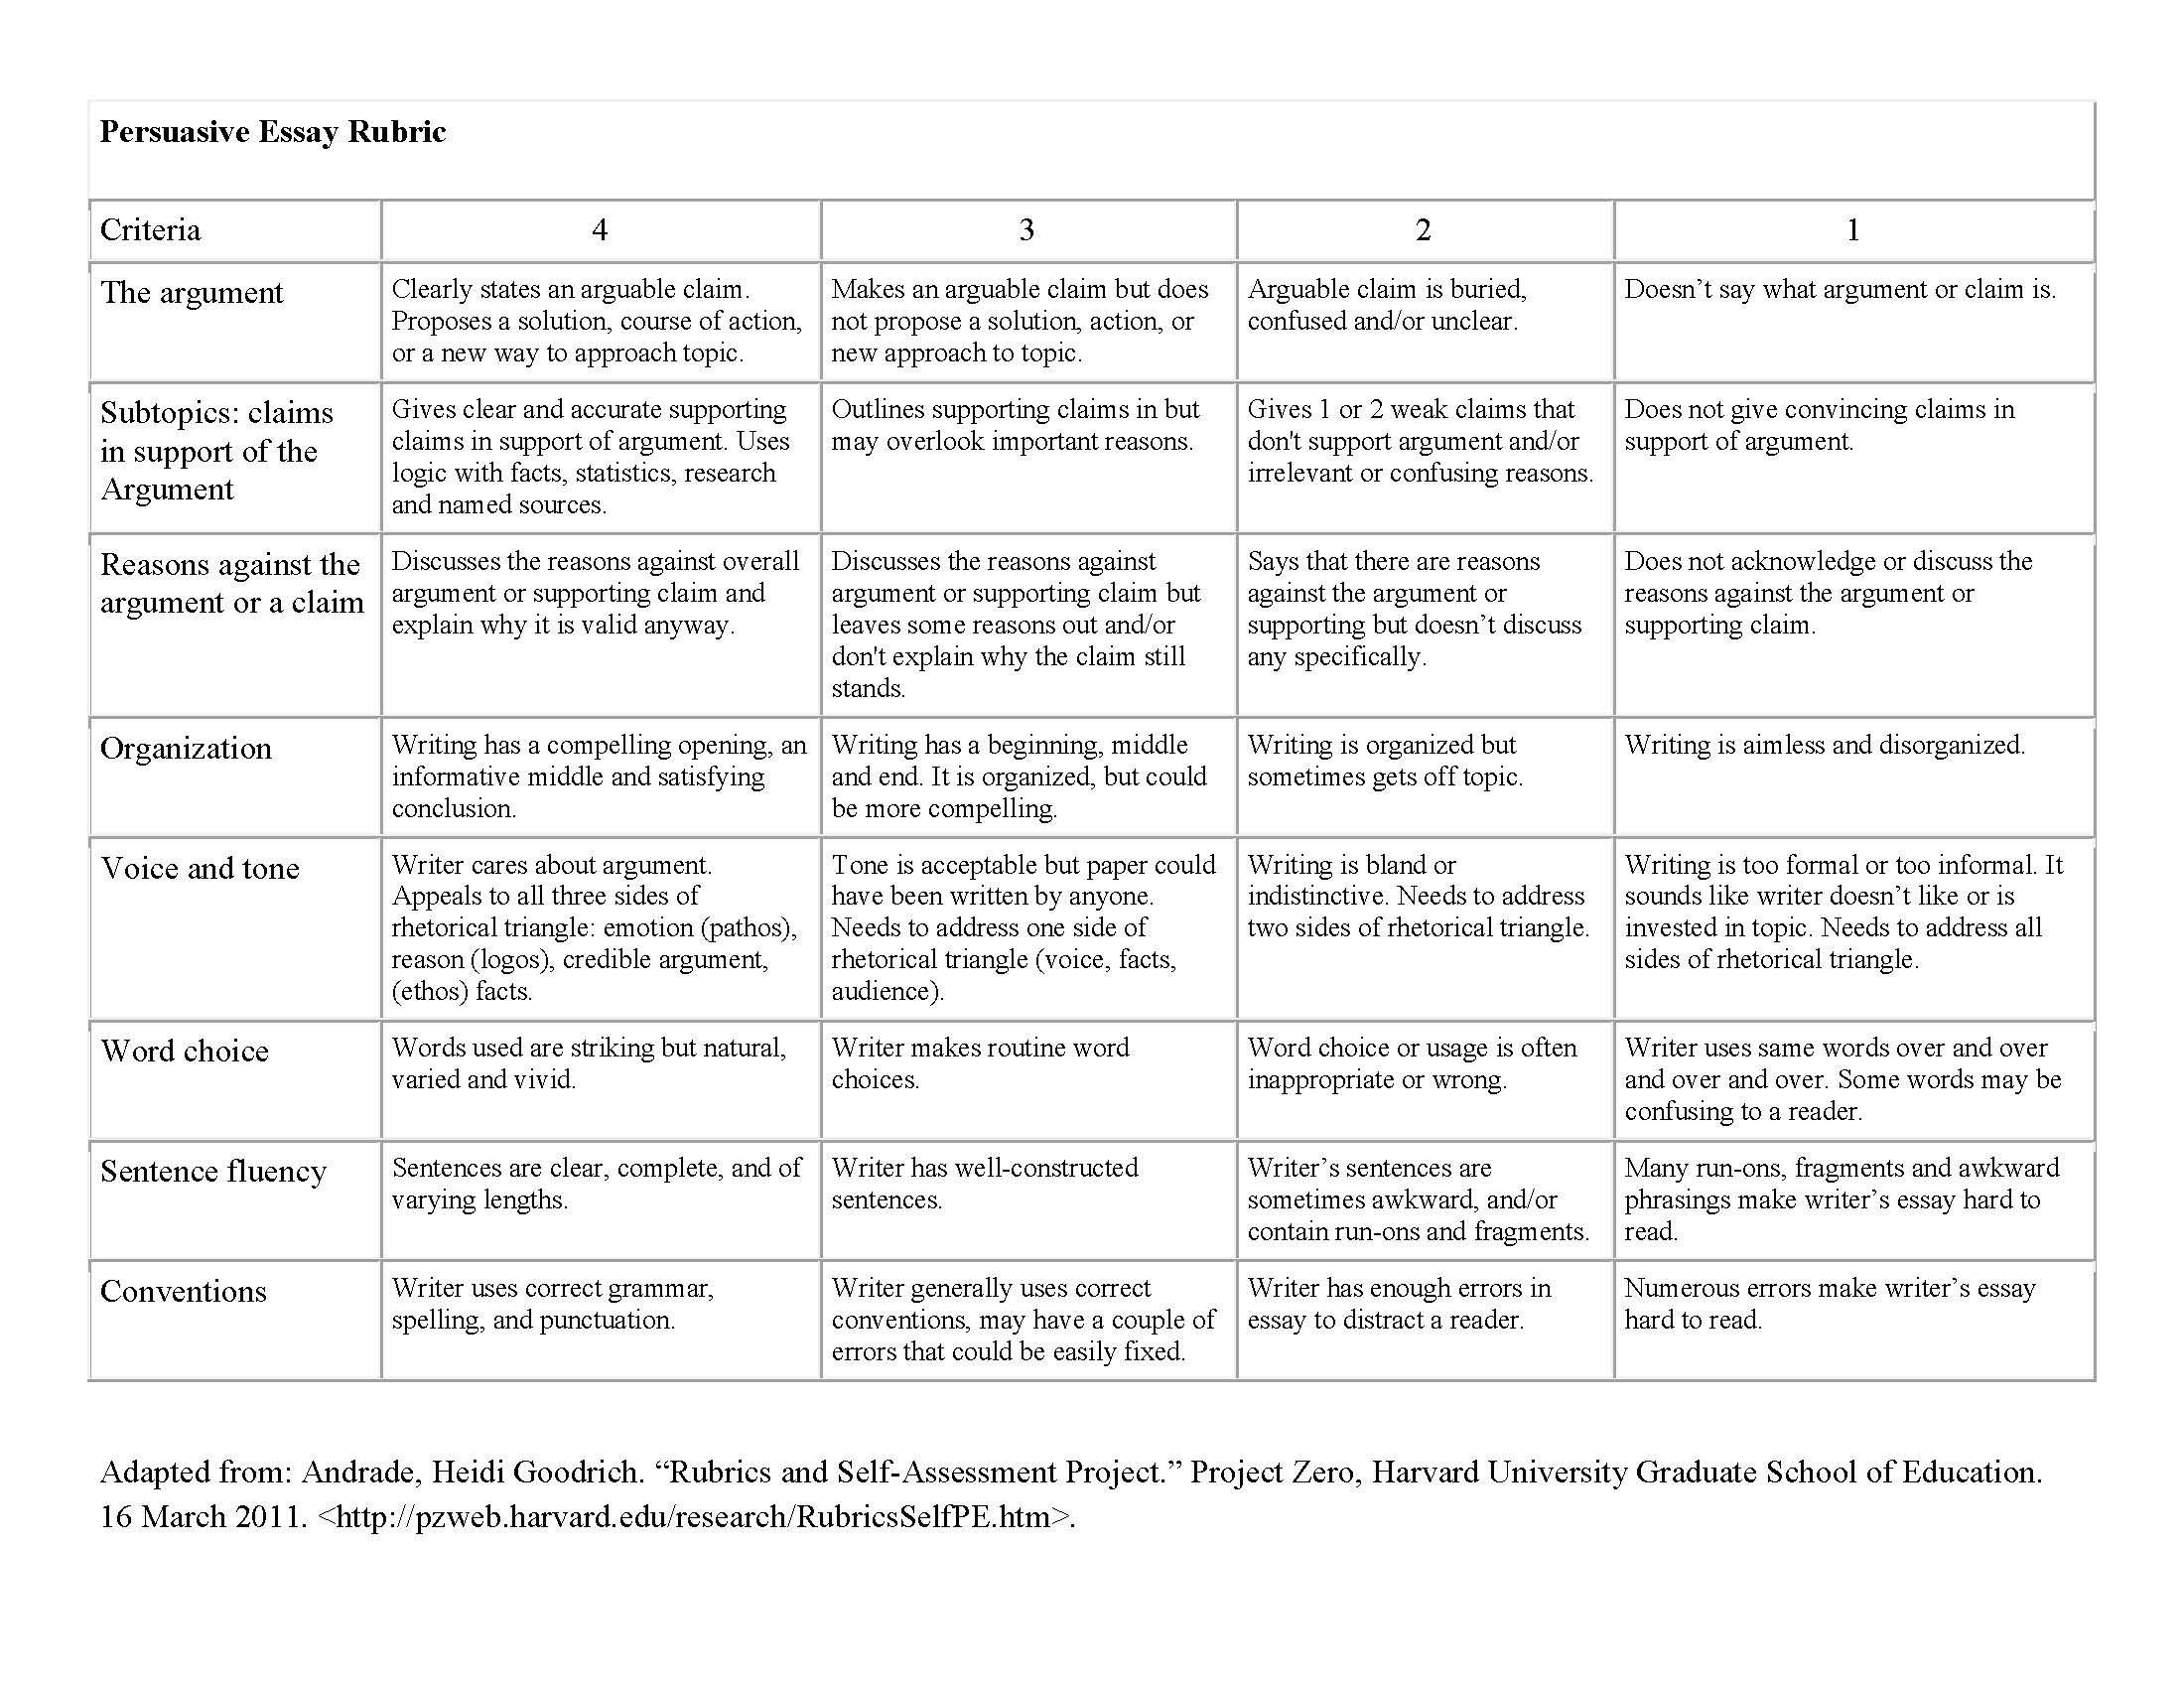 023 Handout Persuasive Essay Rubric Example Pro Death Fearsome Penalty Con Debate Argumentative Outline Full